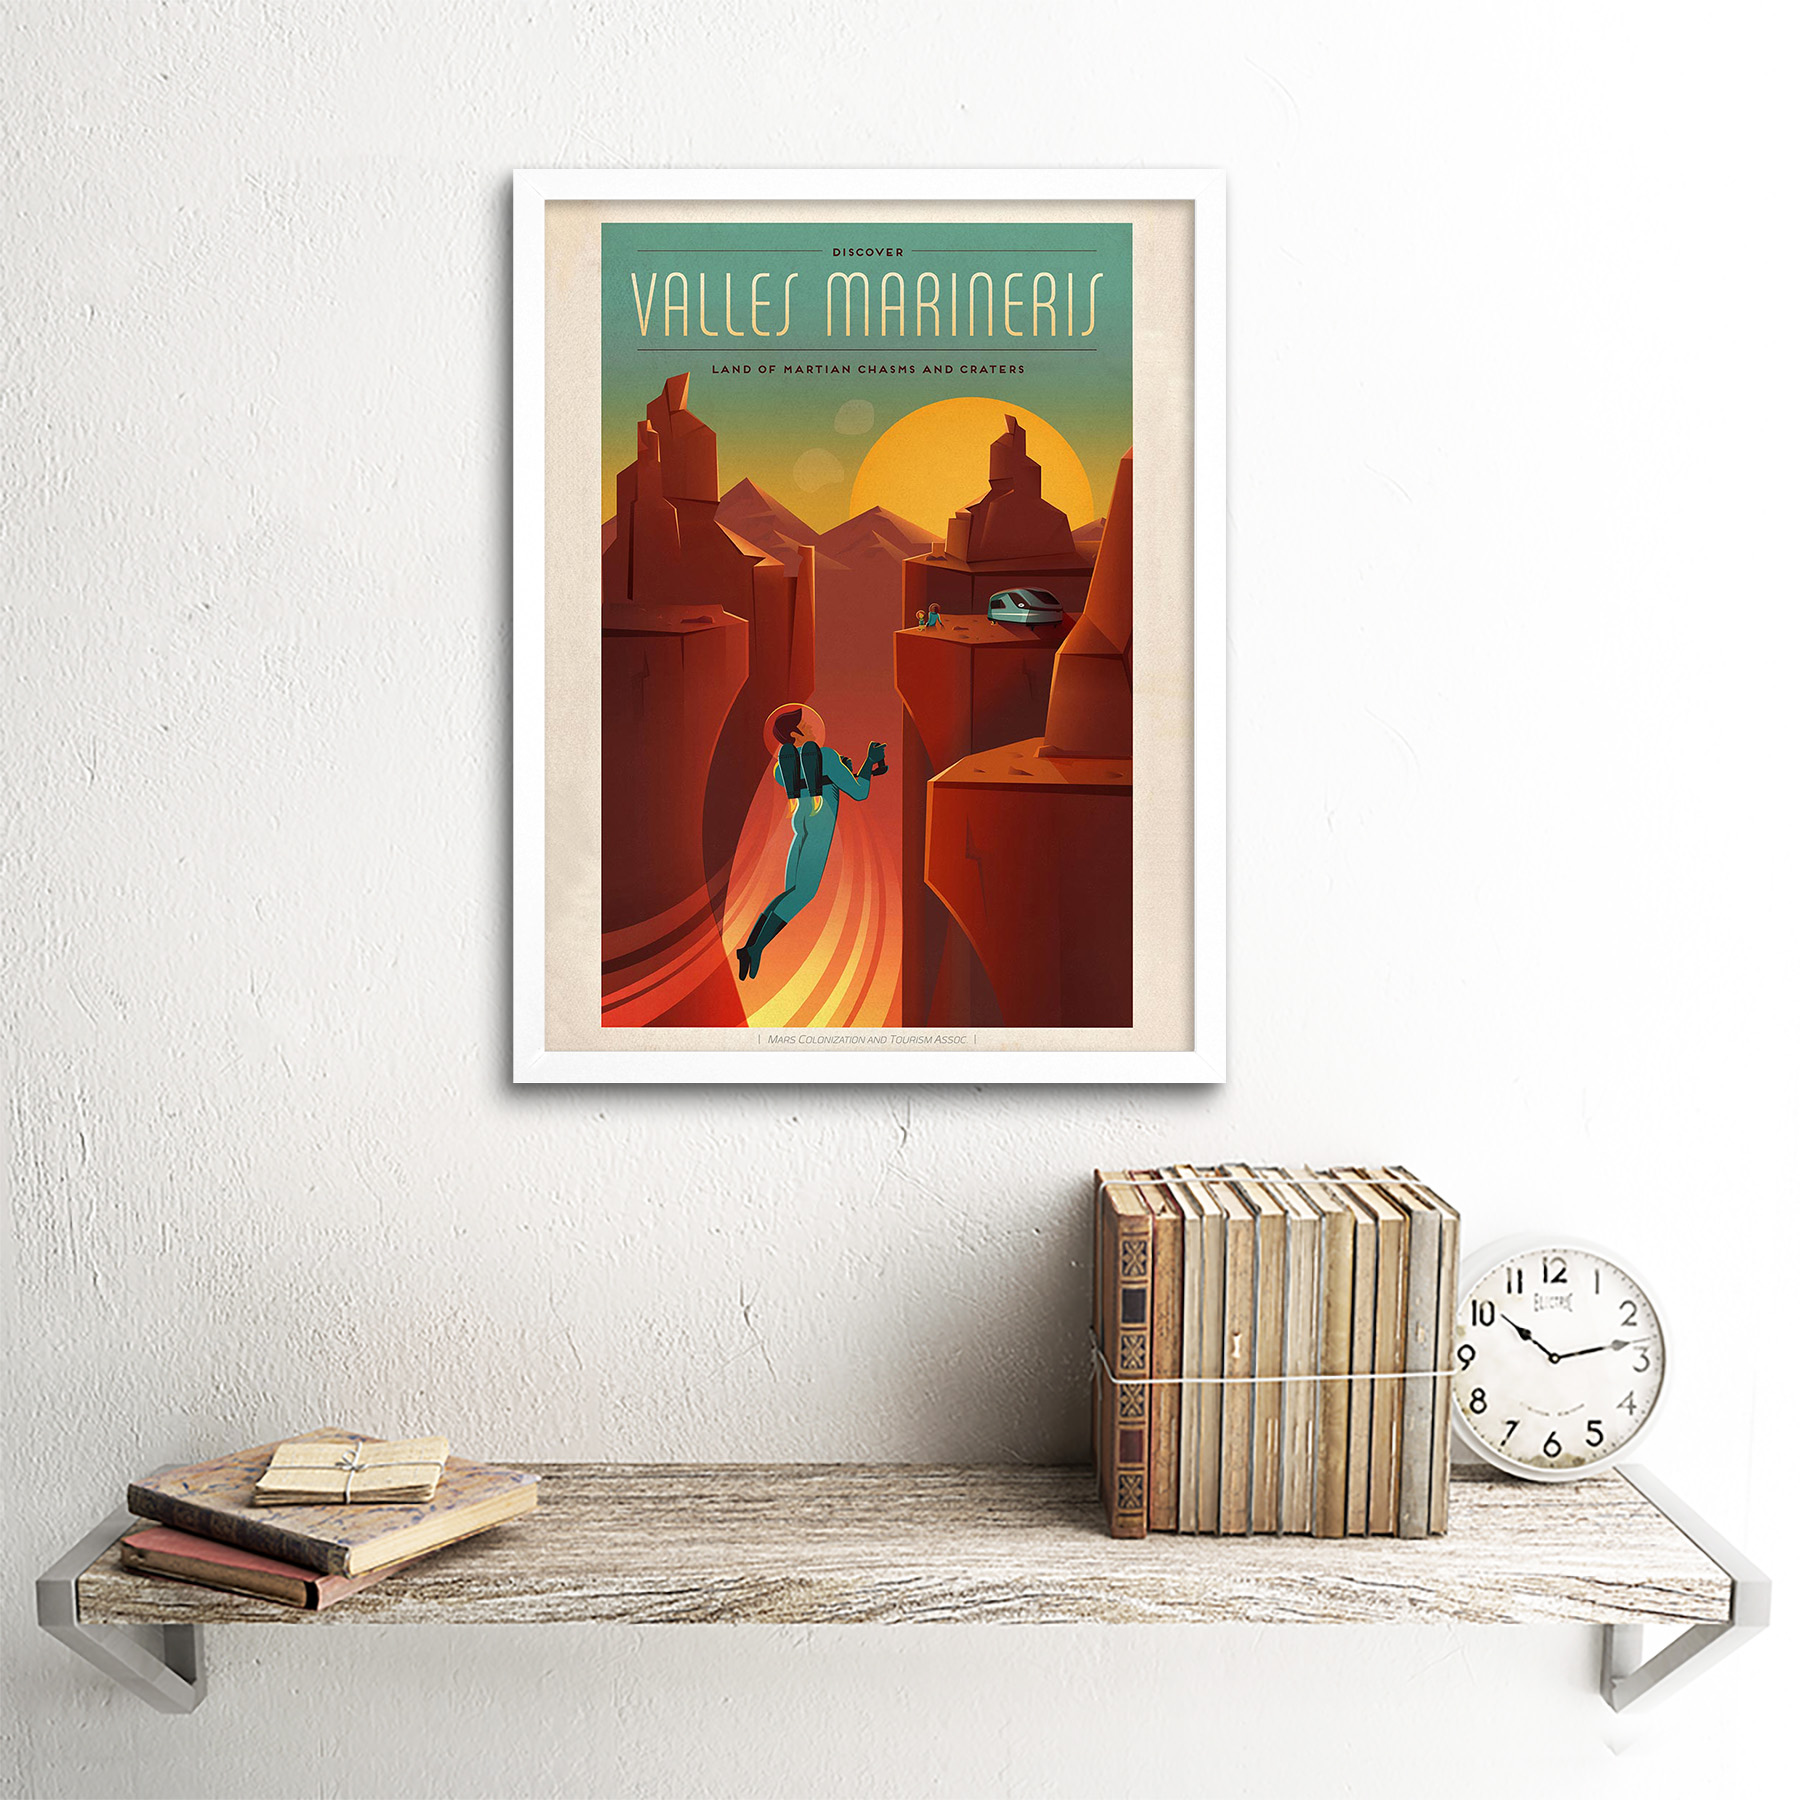 Space Mars Travel Advert Valles Marineris 12X16 Inch Framed Art Print